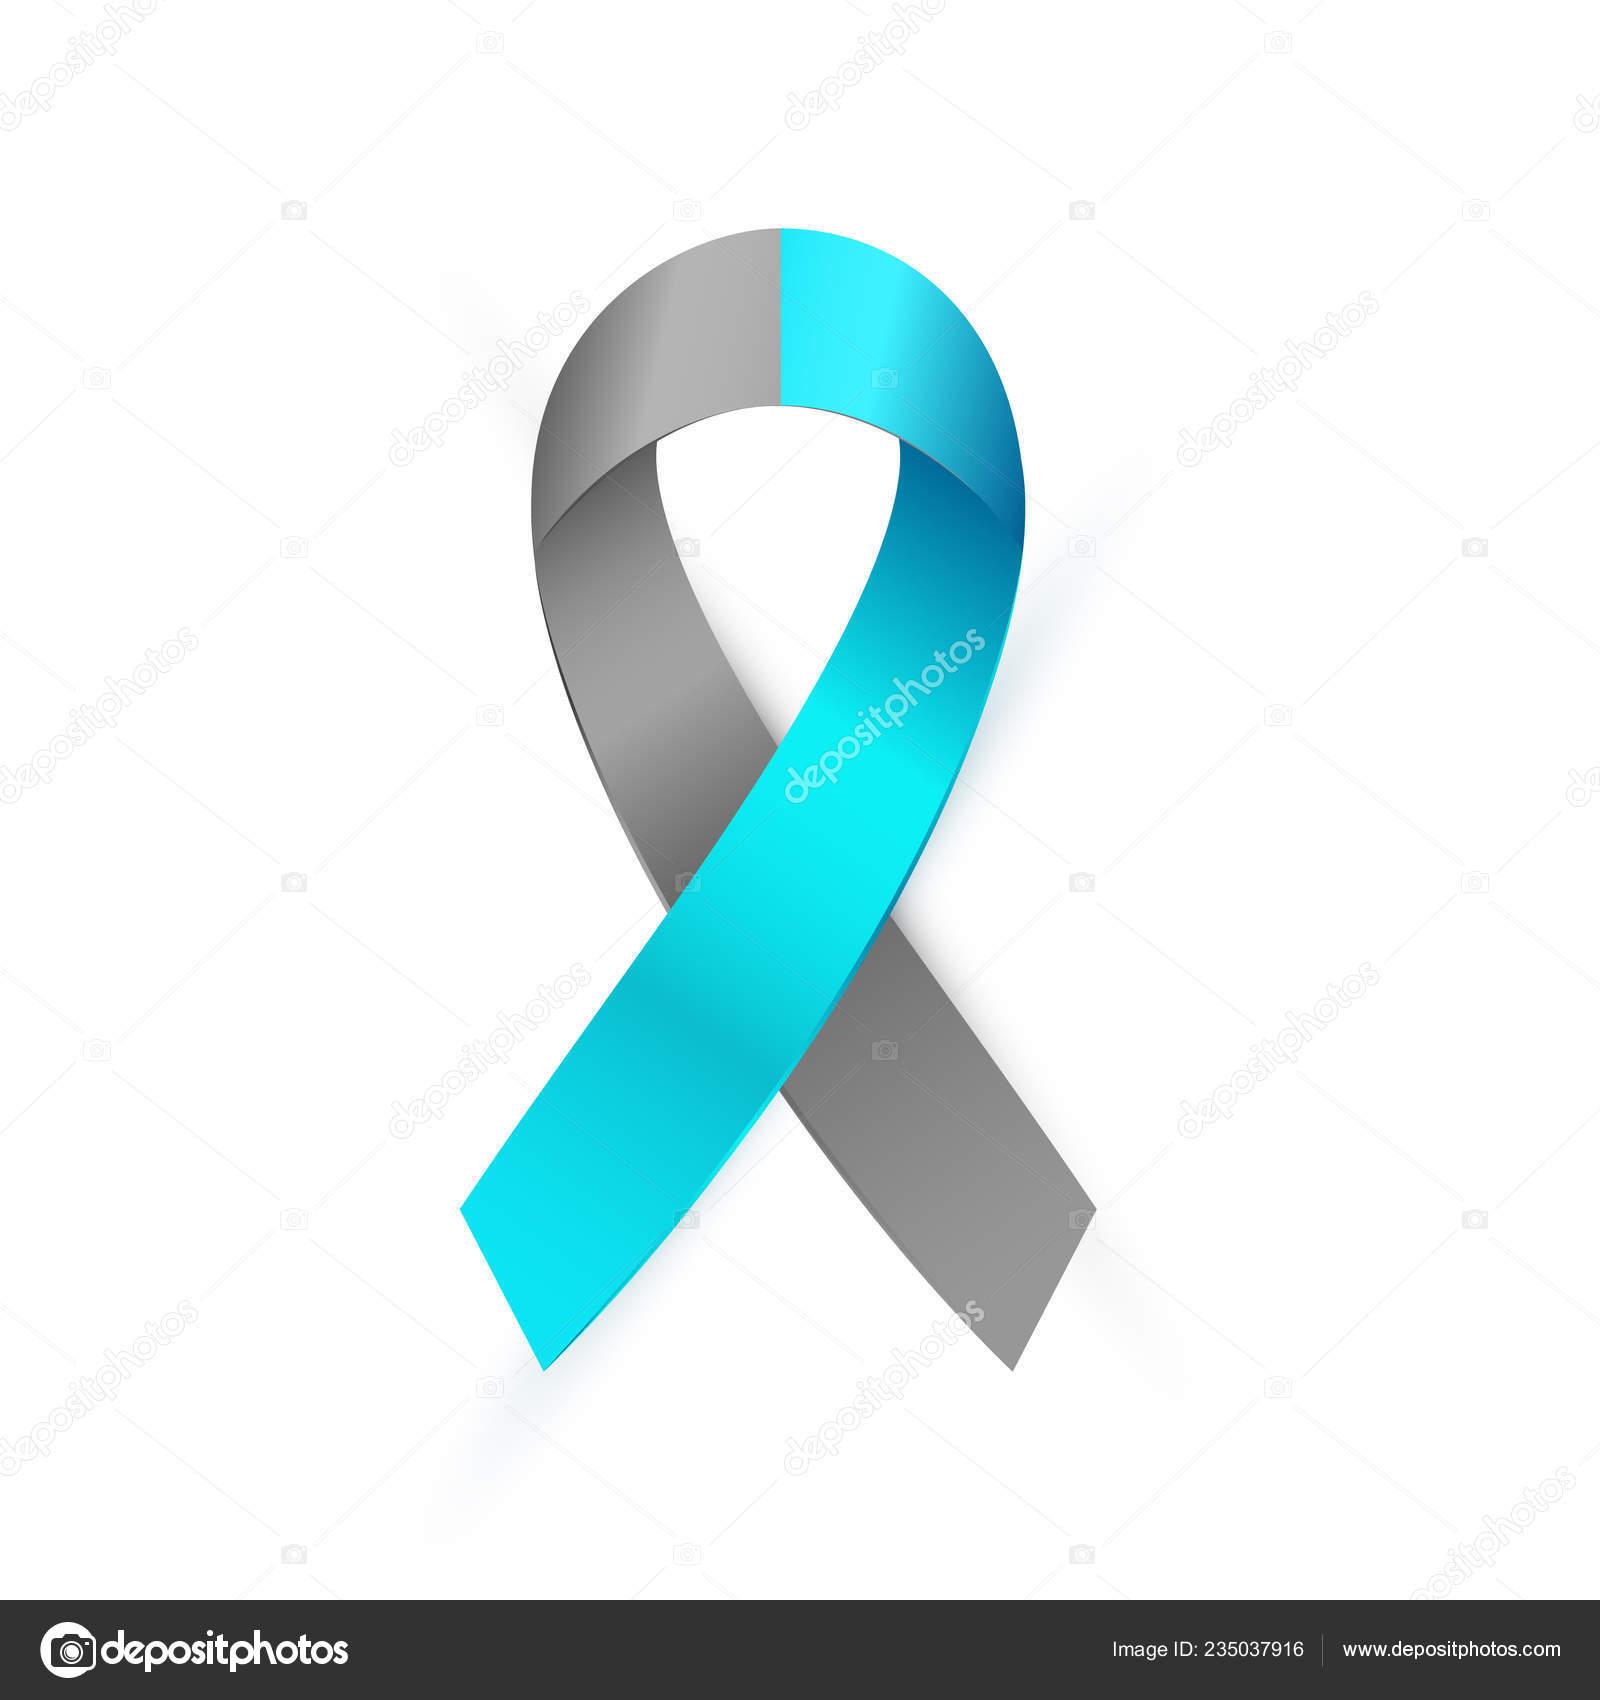 3d Gray And Blue Awareness Ribbon Diabetes Type 1 Borderline